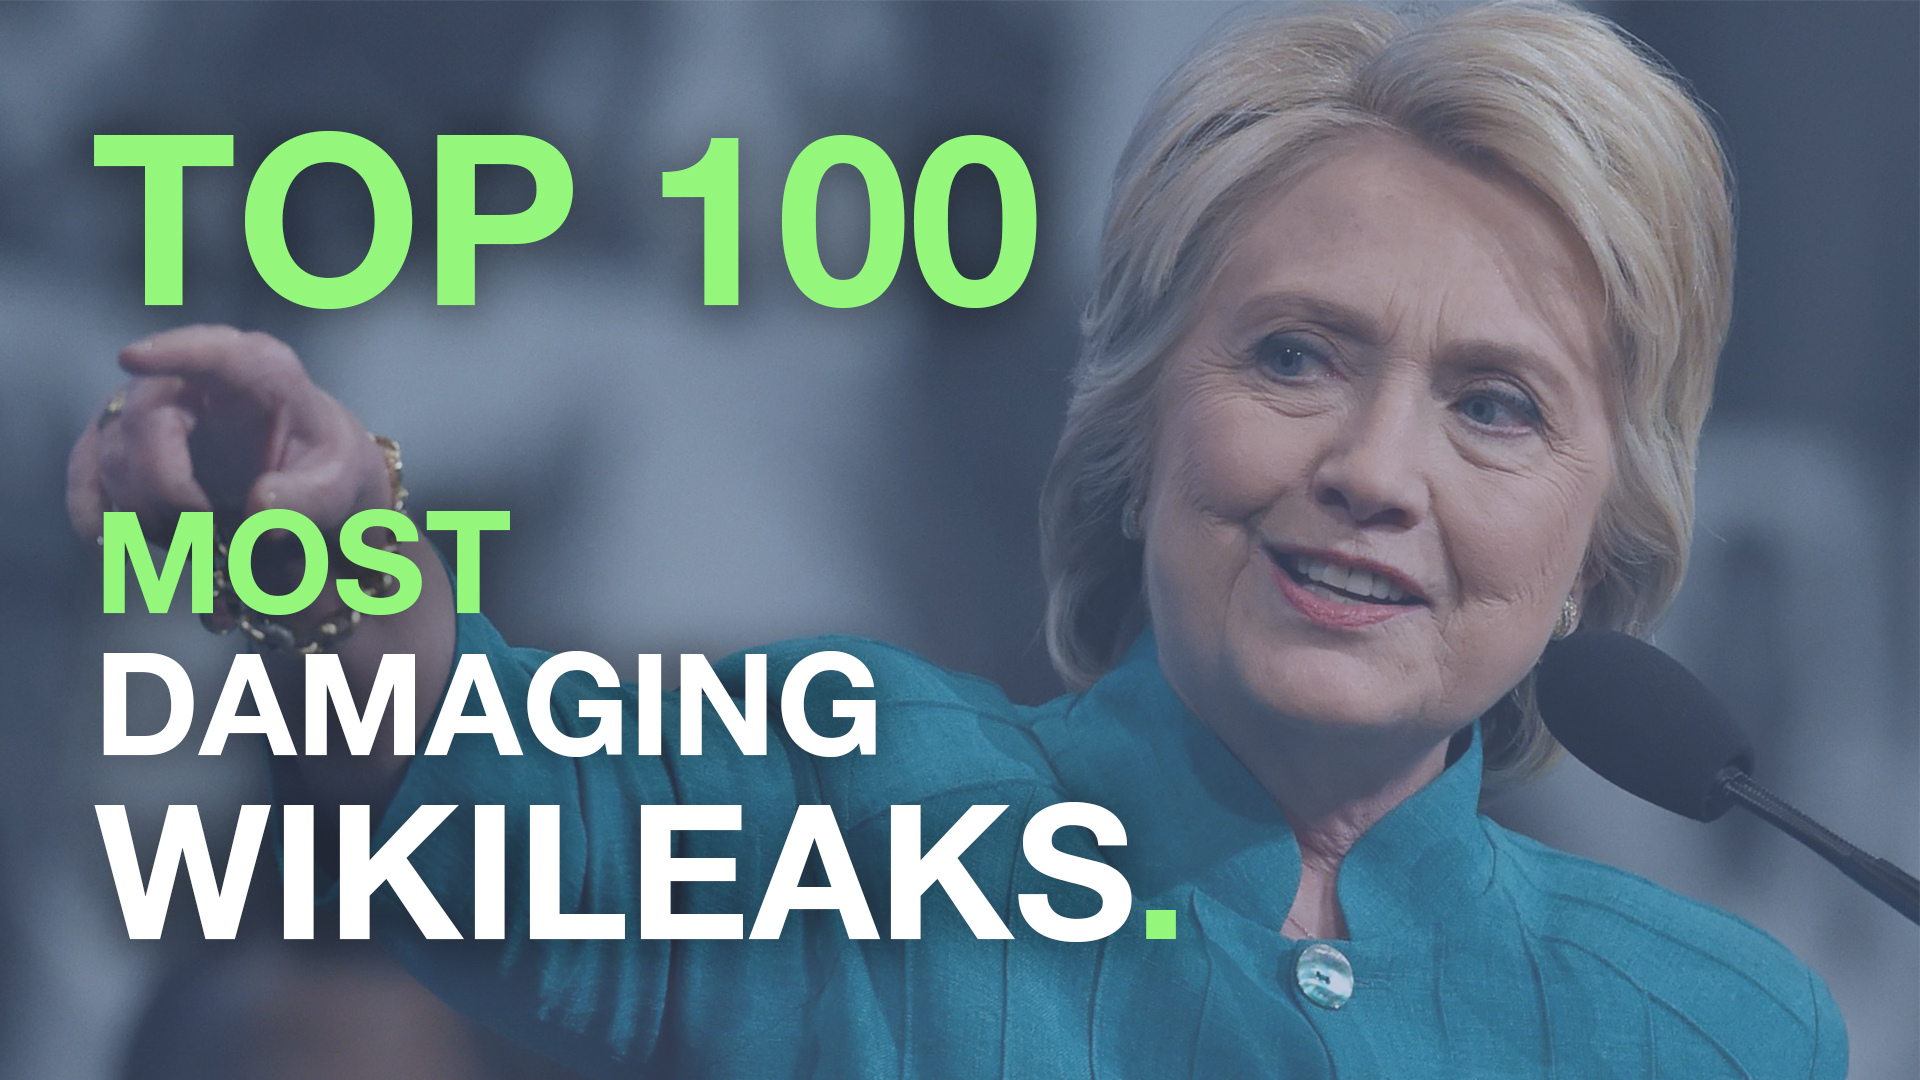 the top 100 most damaging wikileaks